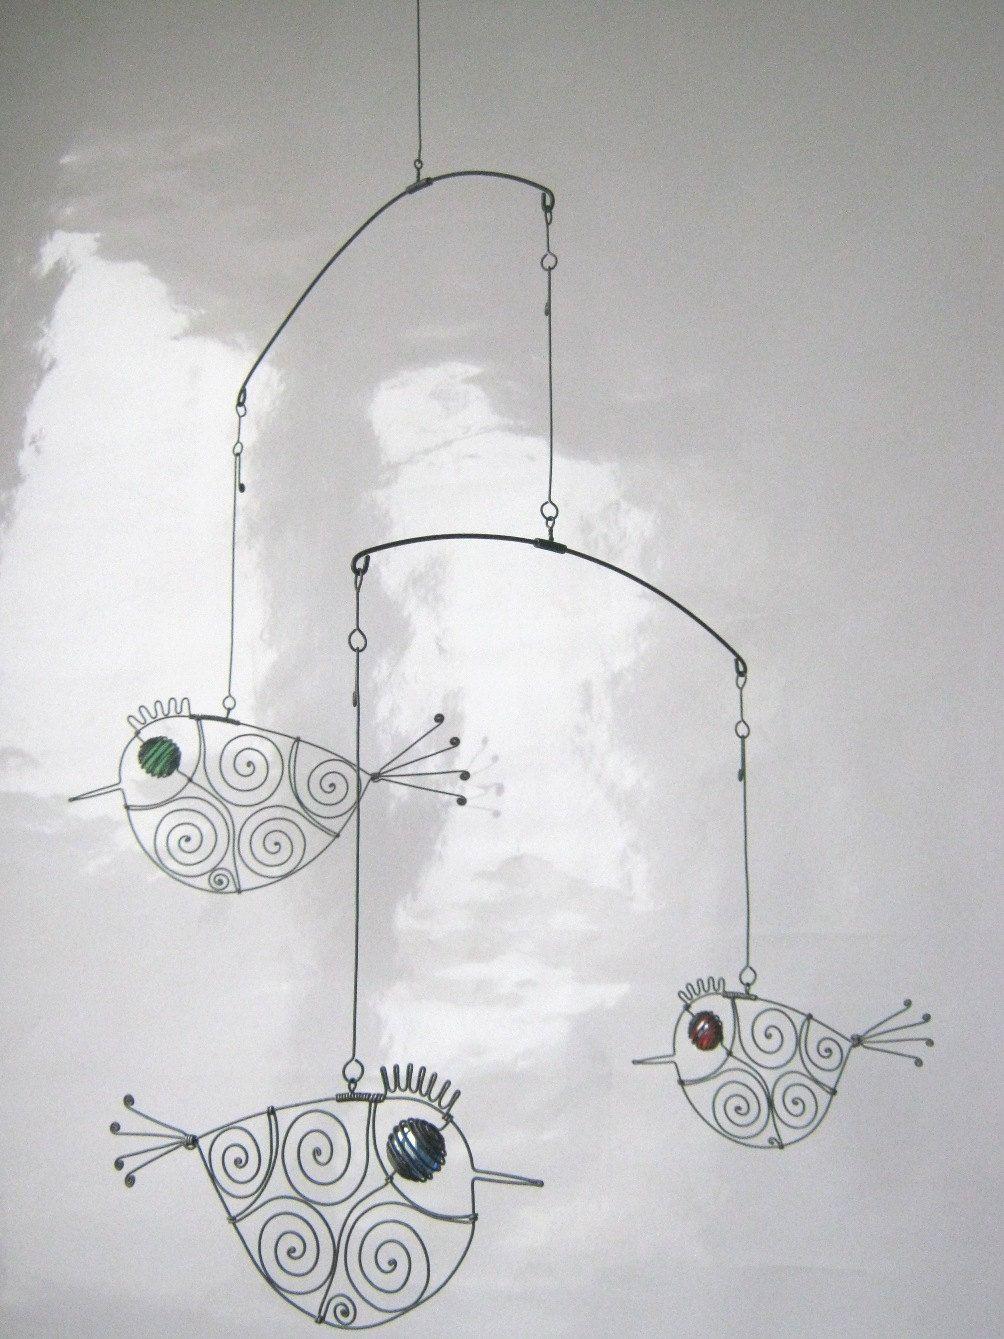 Three Metal Birds Mobile Wire Art Sculpture